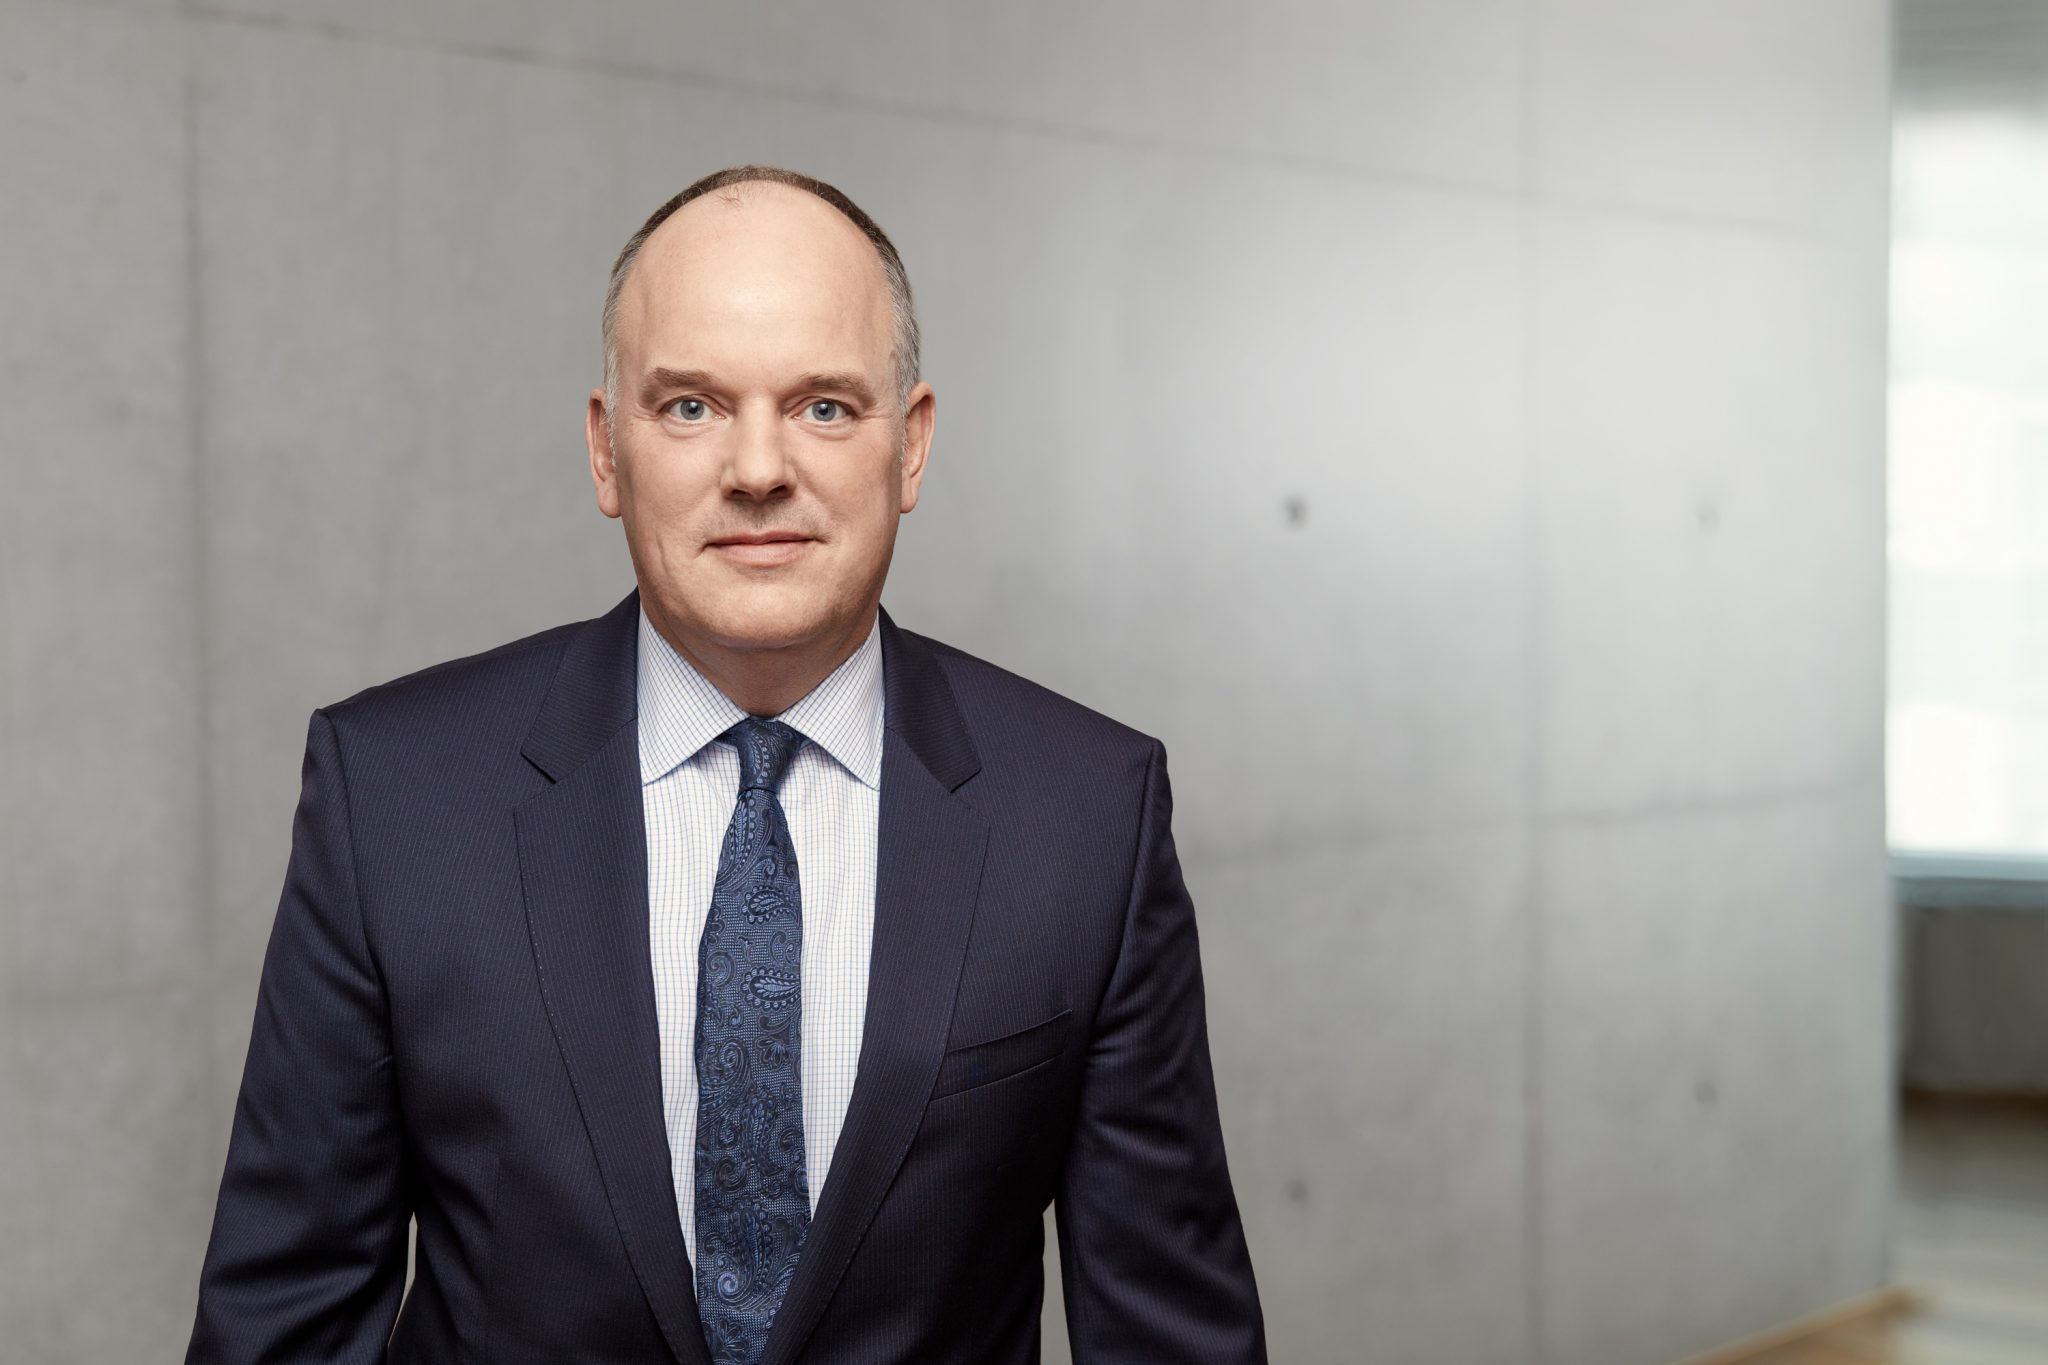 Ólafur Haraldsson